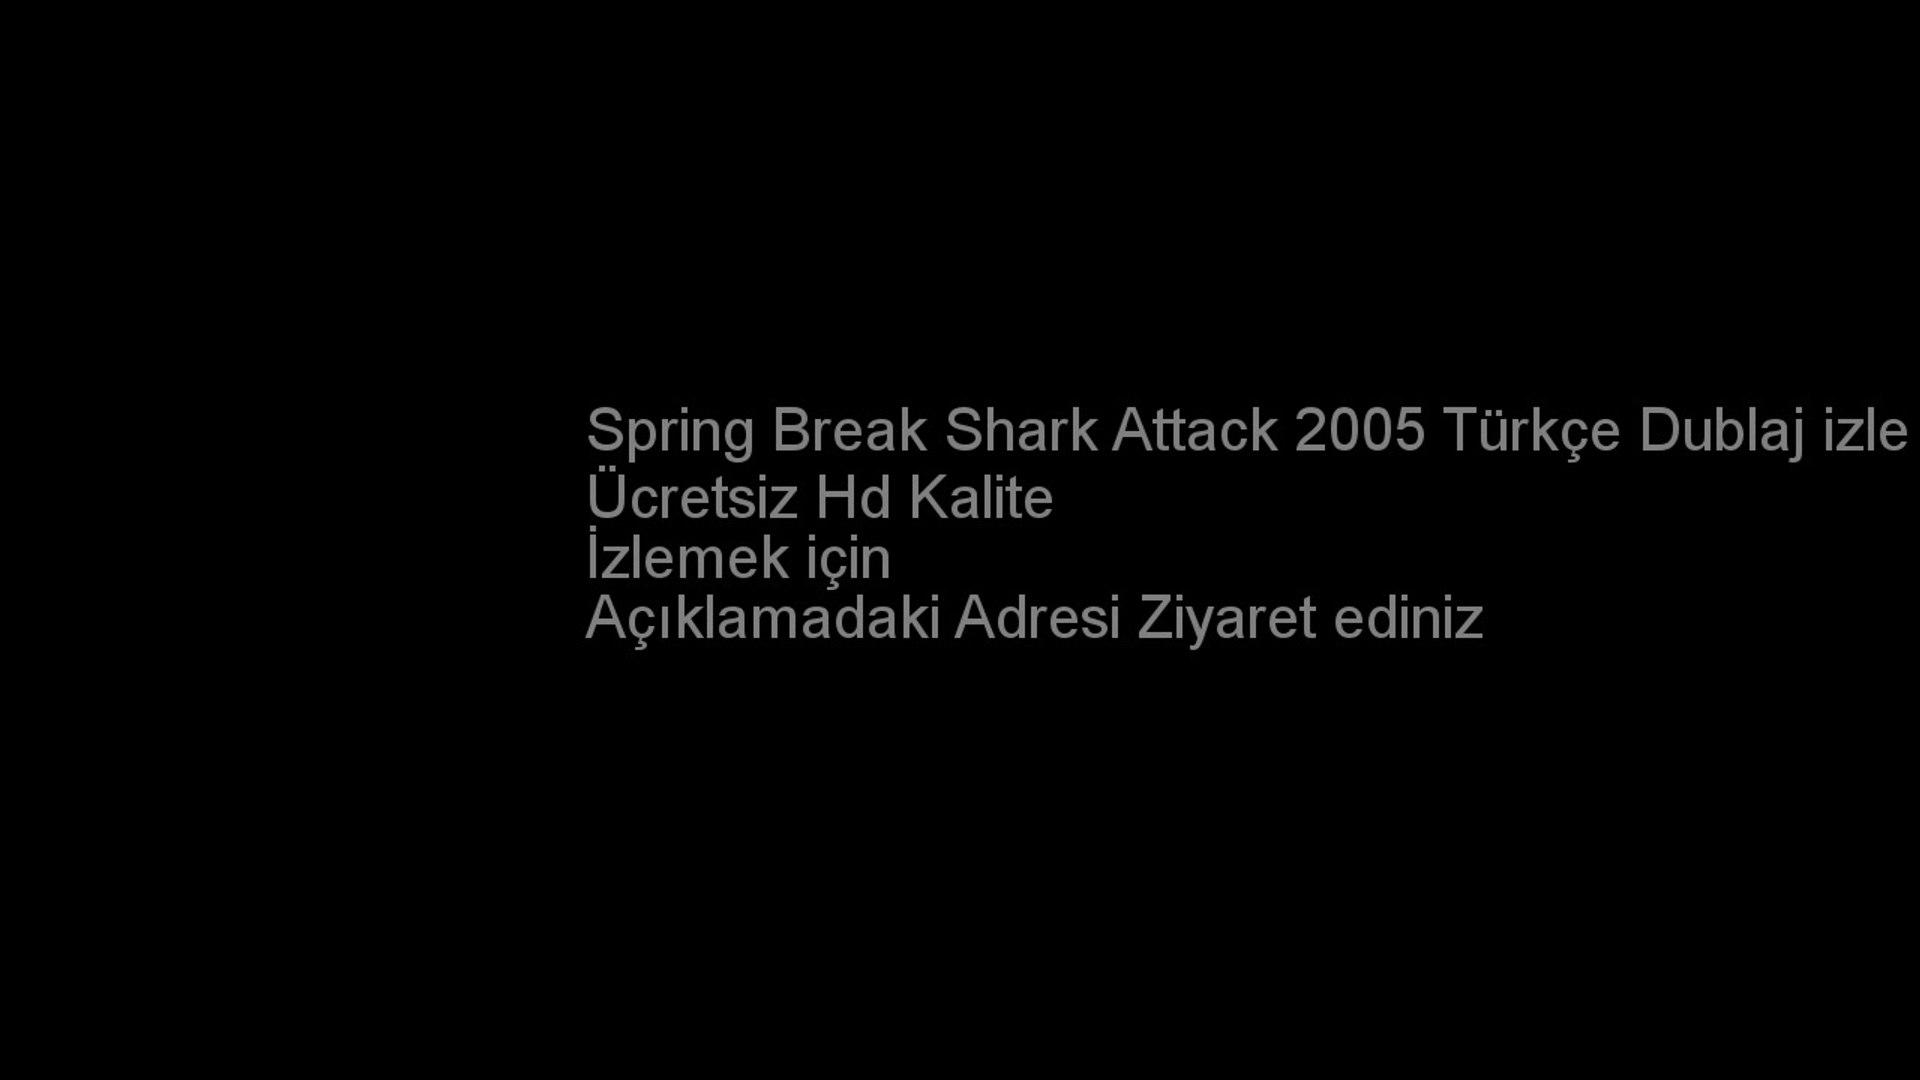 Spring Break Shark Attack 2005 Türkçe Dublaj izle